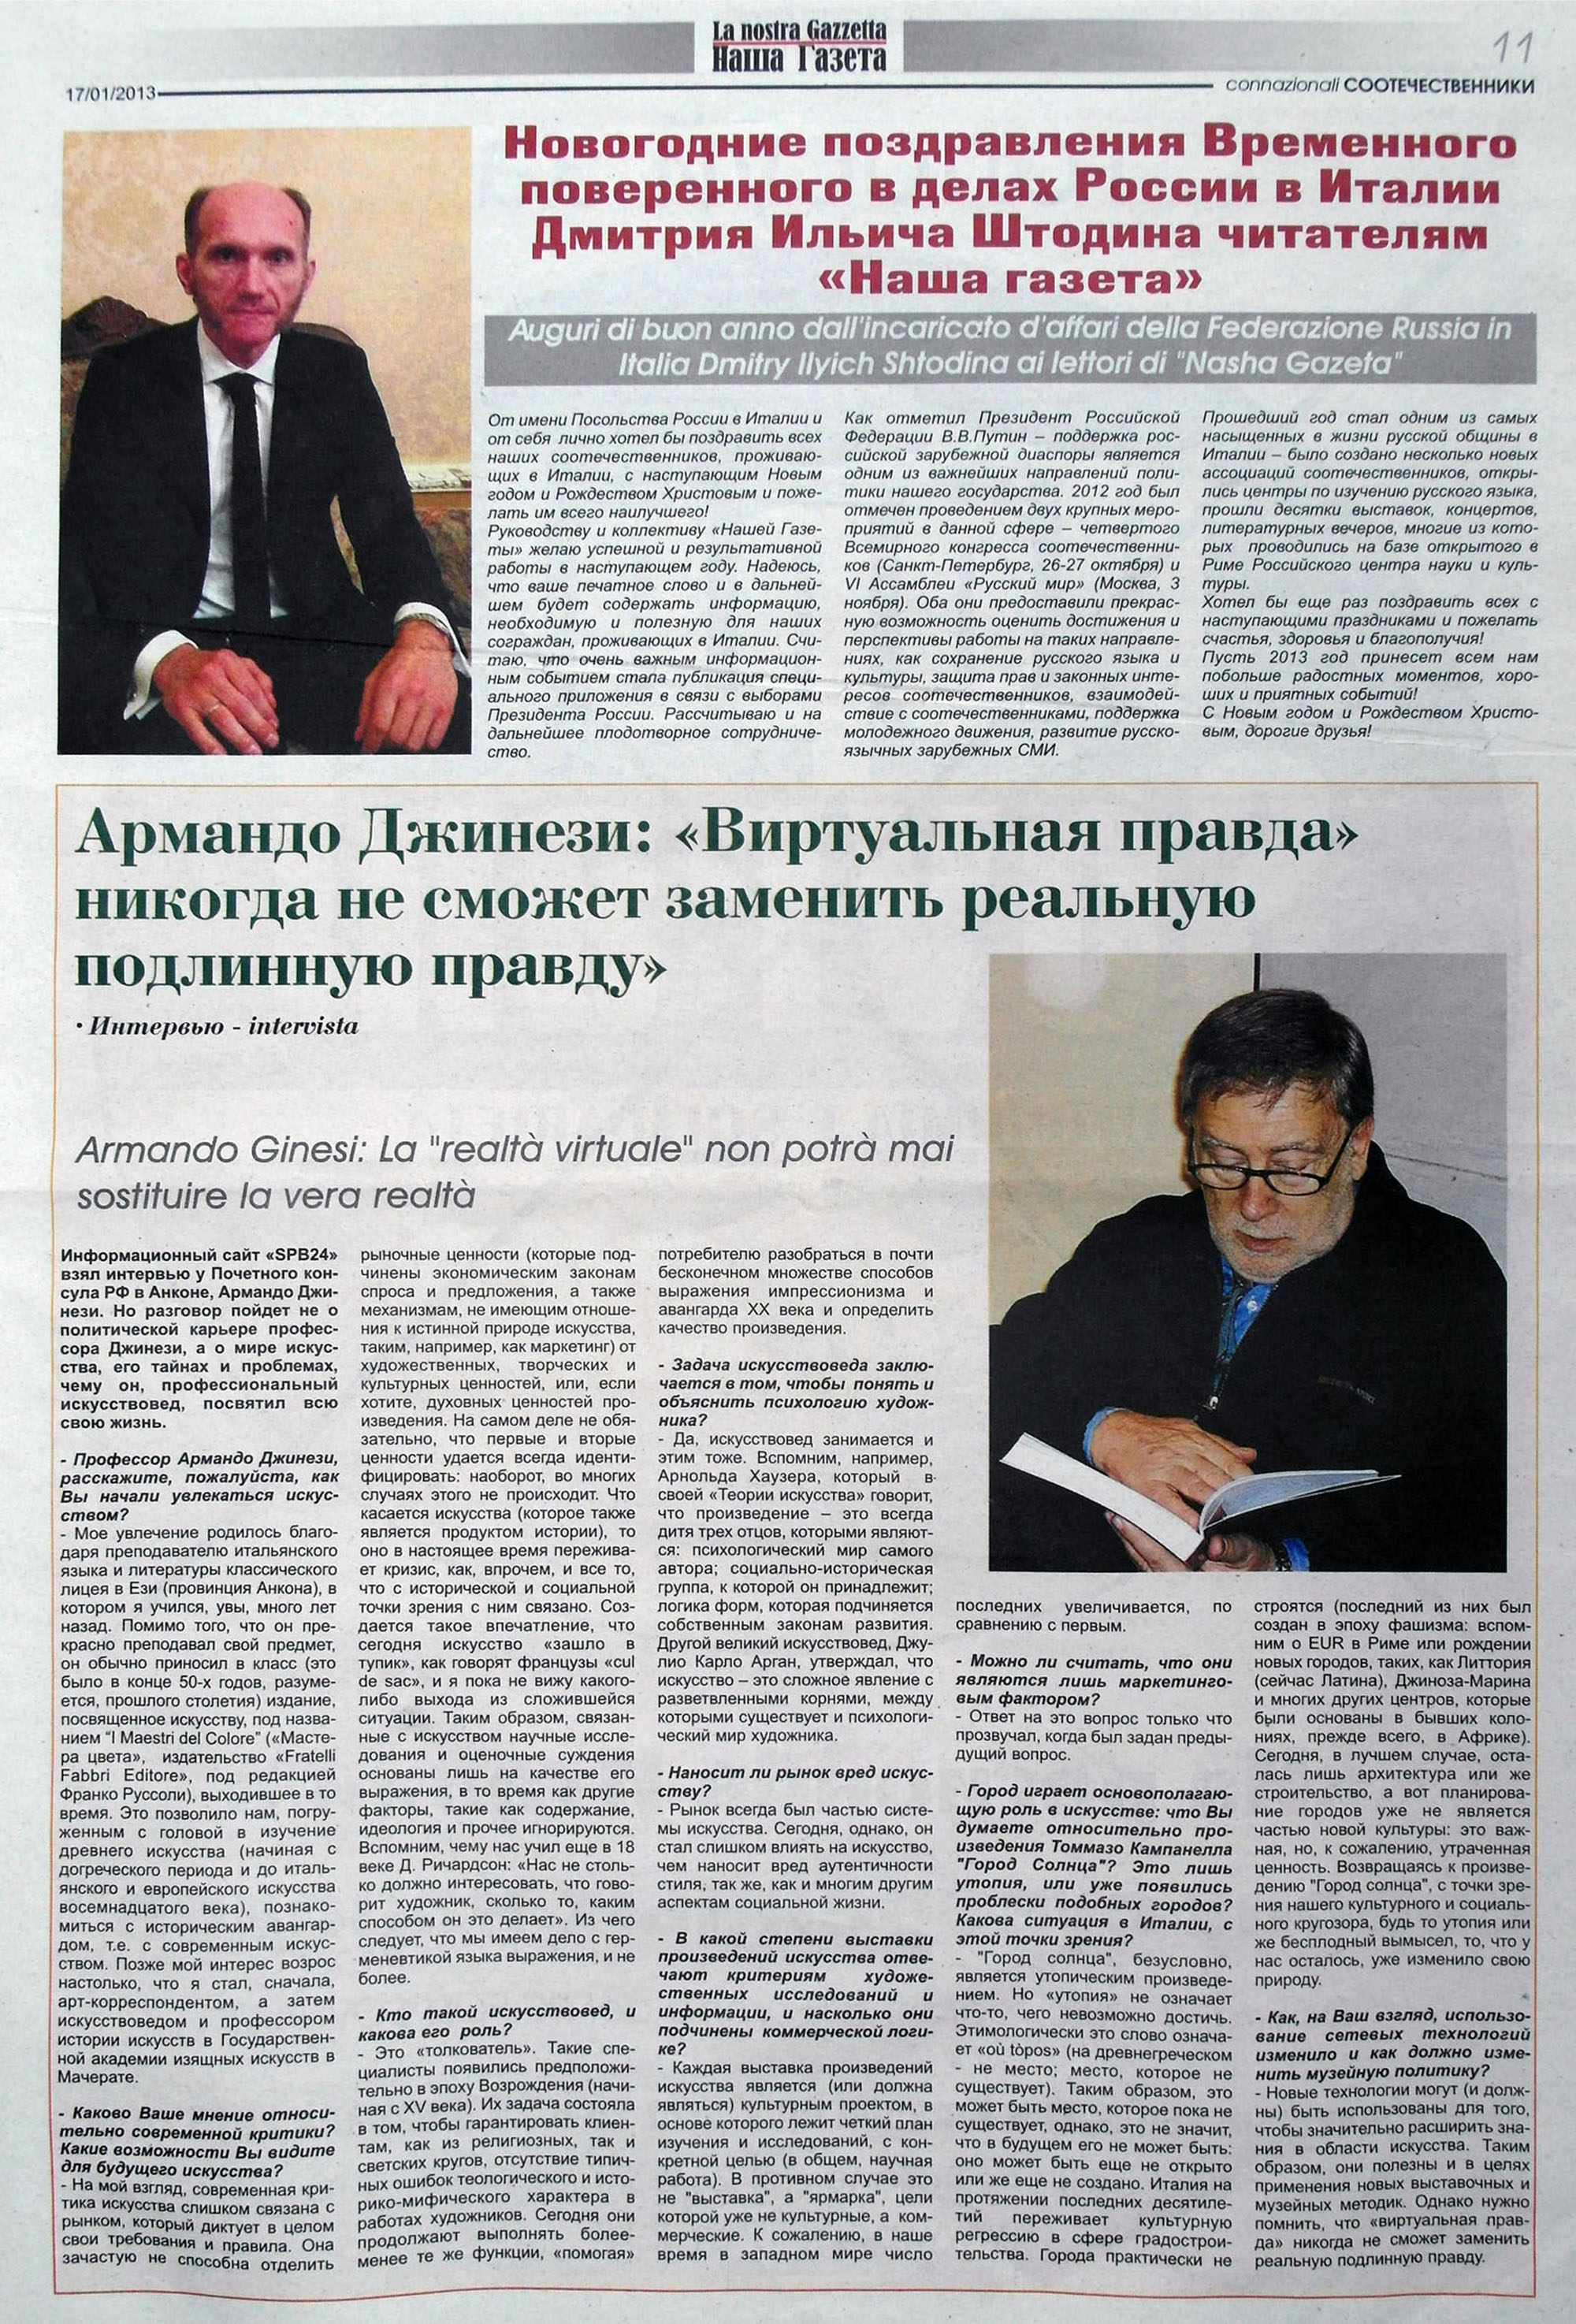 20/02/2013 Mosca - La Nostra Gazzetta gennaio 2013